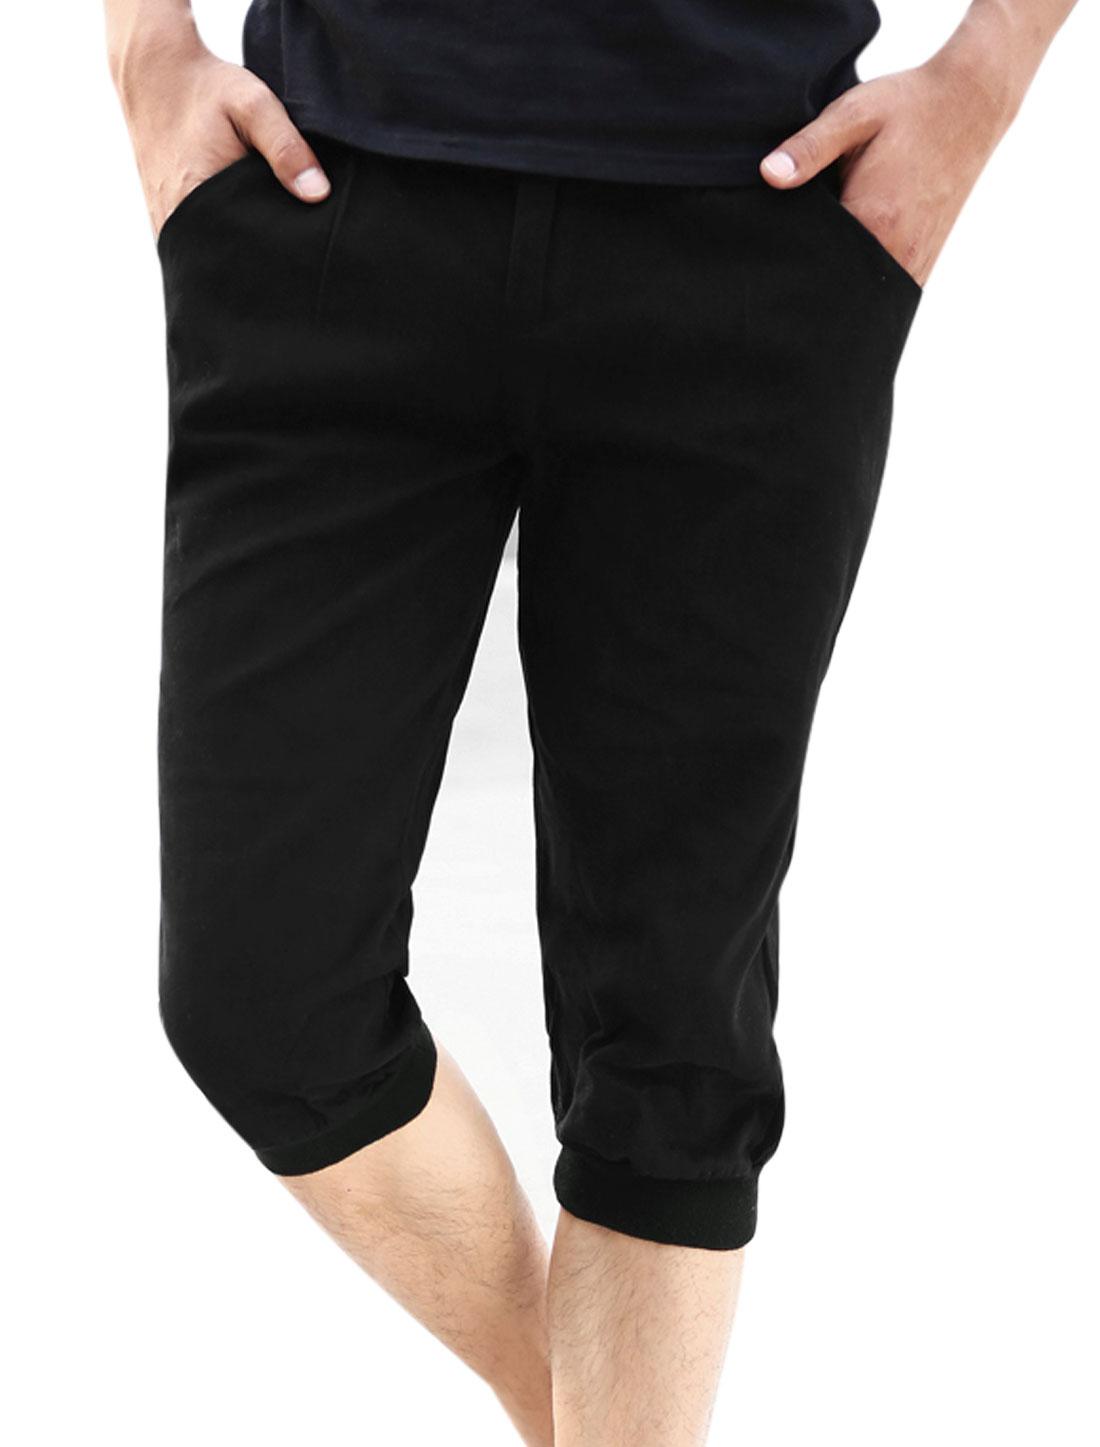 Belt Loop Zip Fly Four Pockets Capris Pants for Men Black W32